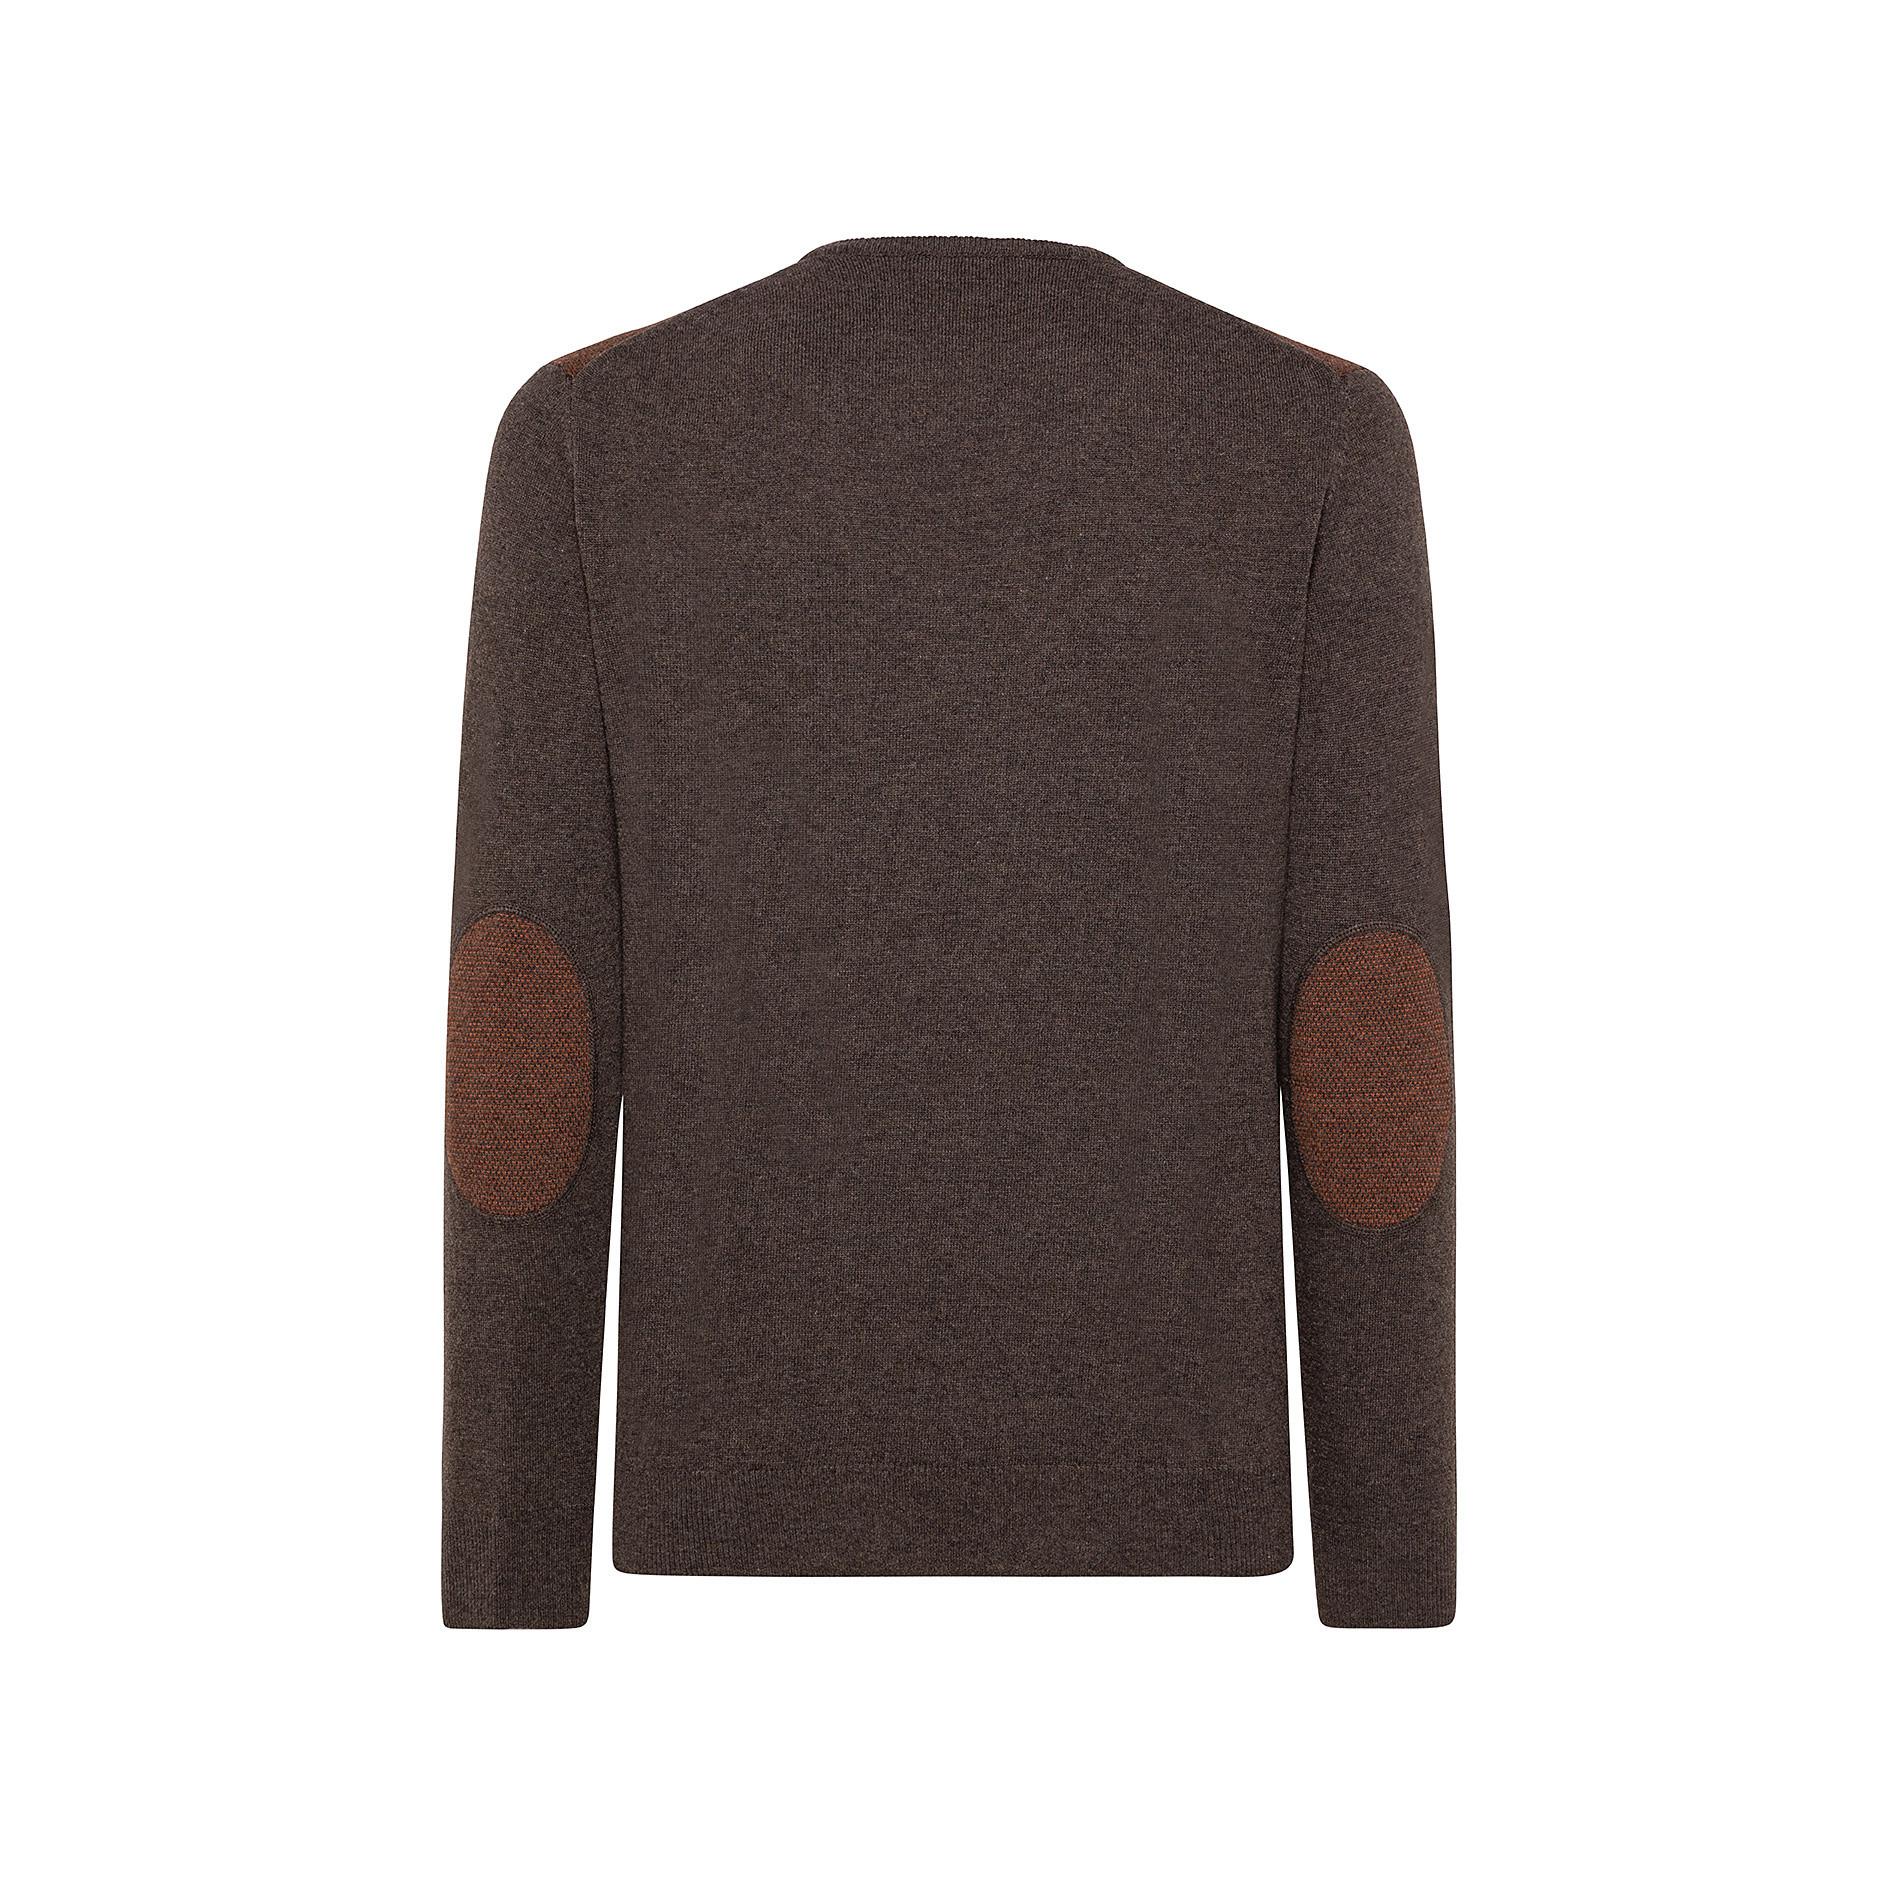 Pullover girocollo misto lana motivo piquet, Marrone, large image number 1